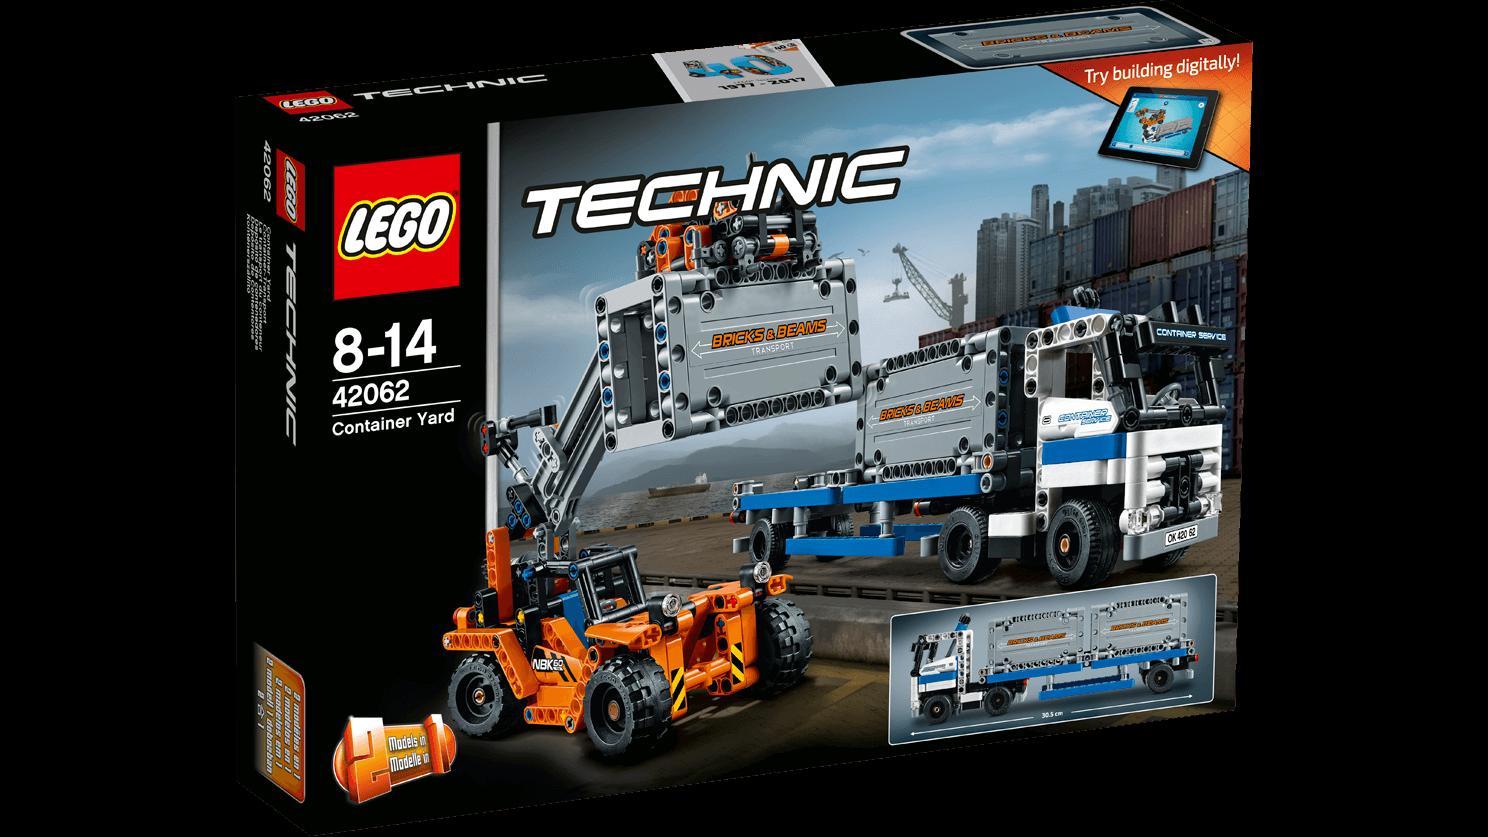 Lego Technic Container Yard 42062 East Coast Radio Online Shop